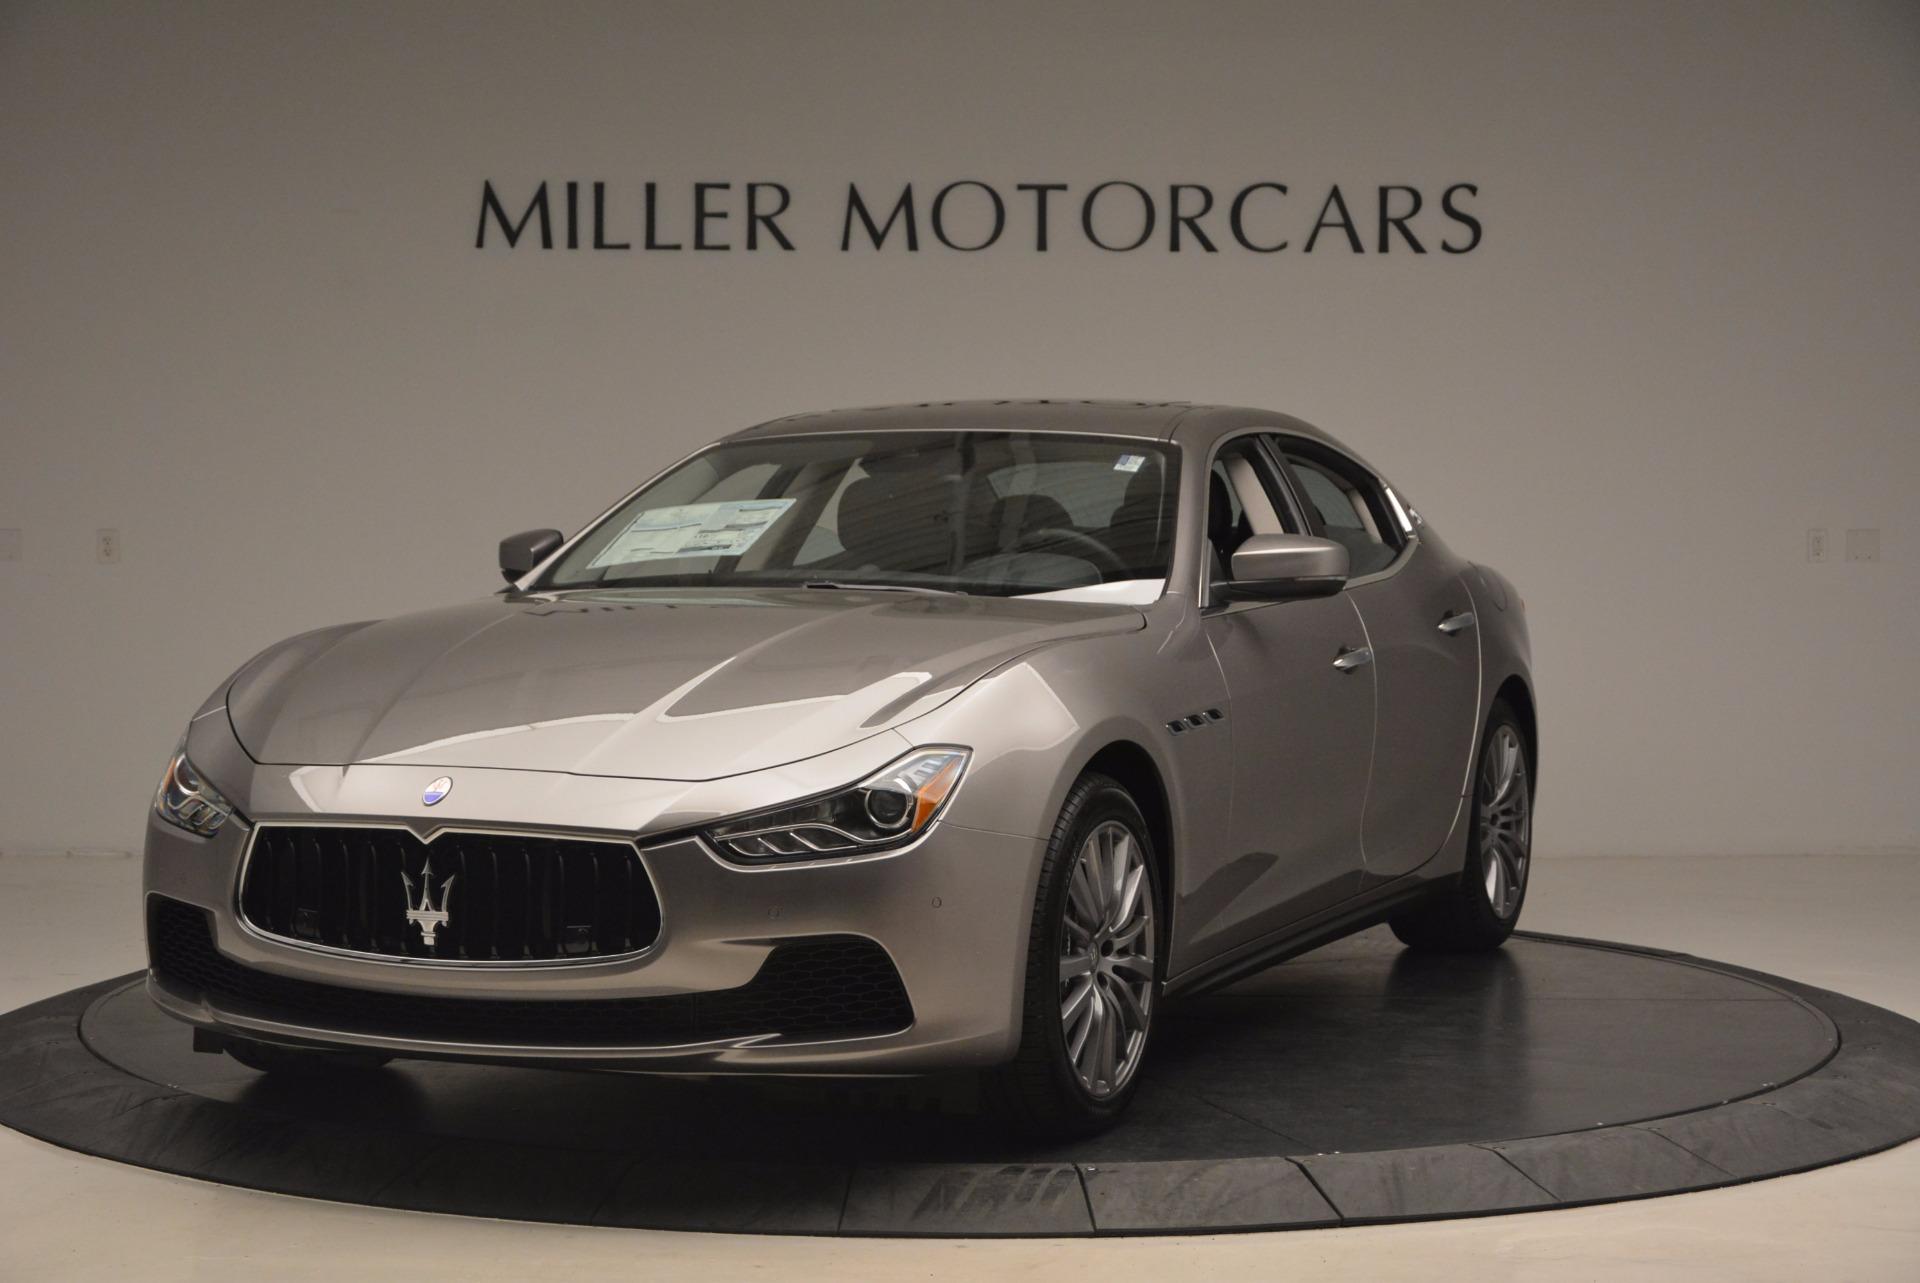 New 2017 Maserati Ghibli SQ4 For Sale In Greenwich, CT 1109_main